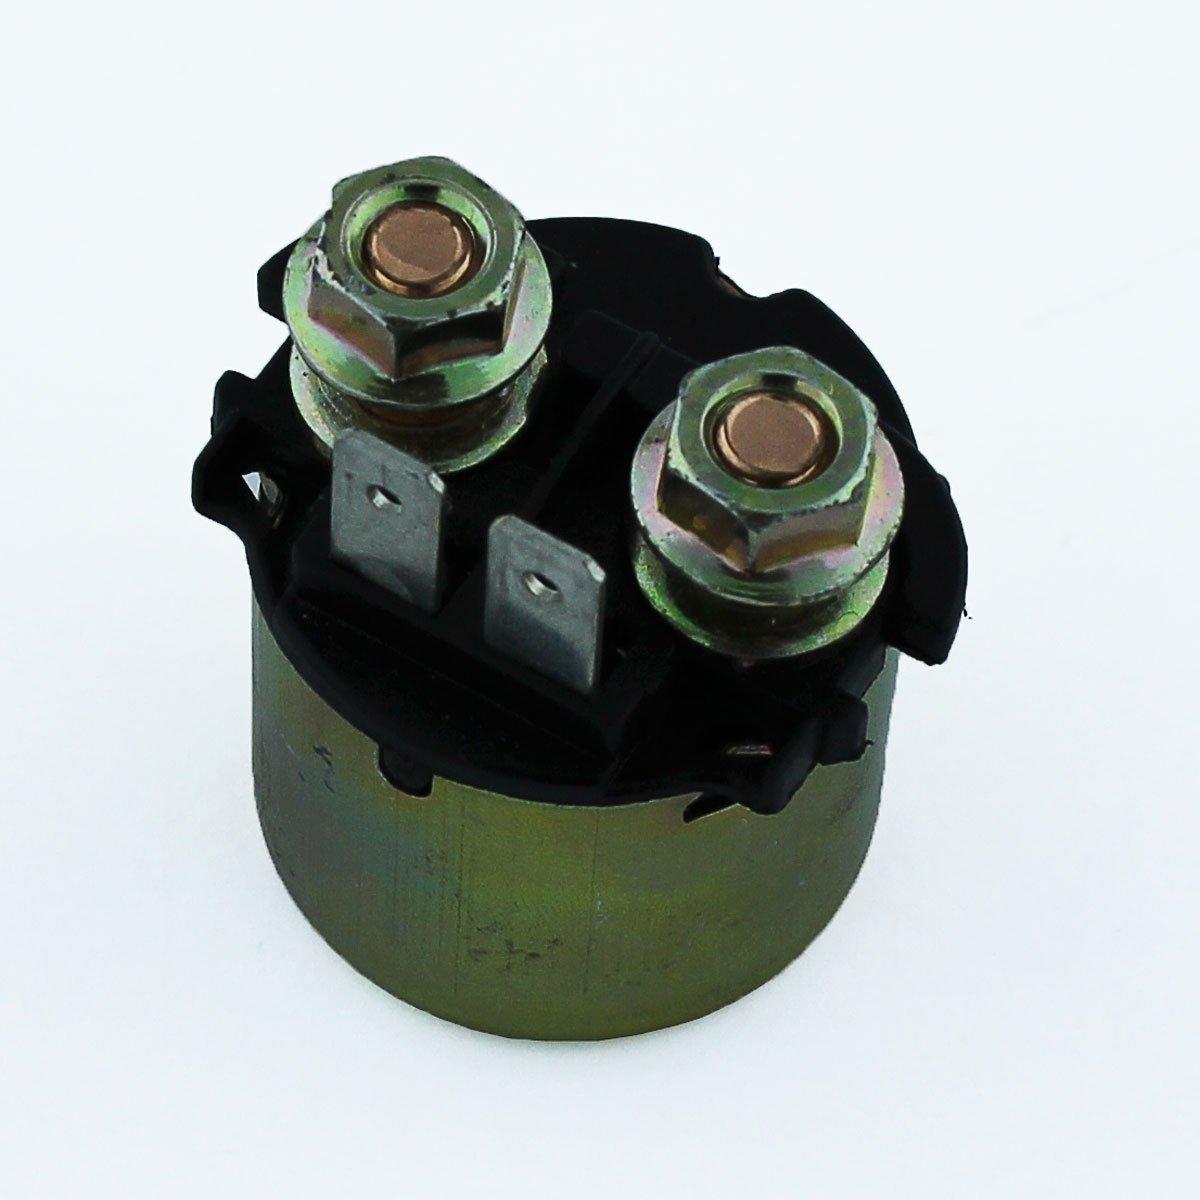 612umrCN%2BEL._SL1200_ amazon com caltric starter solenoid relay fits kawasaki brute  at soozxer.org